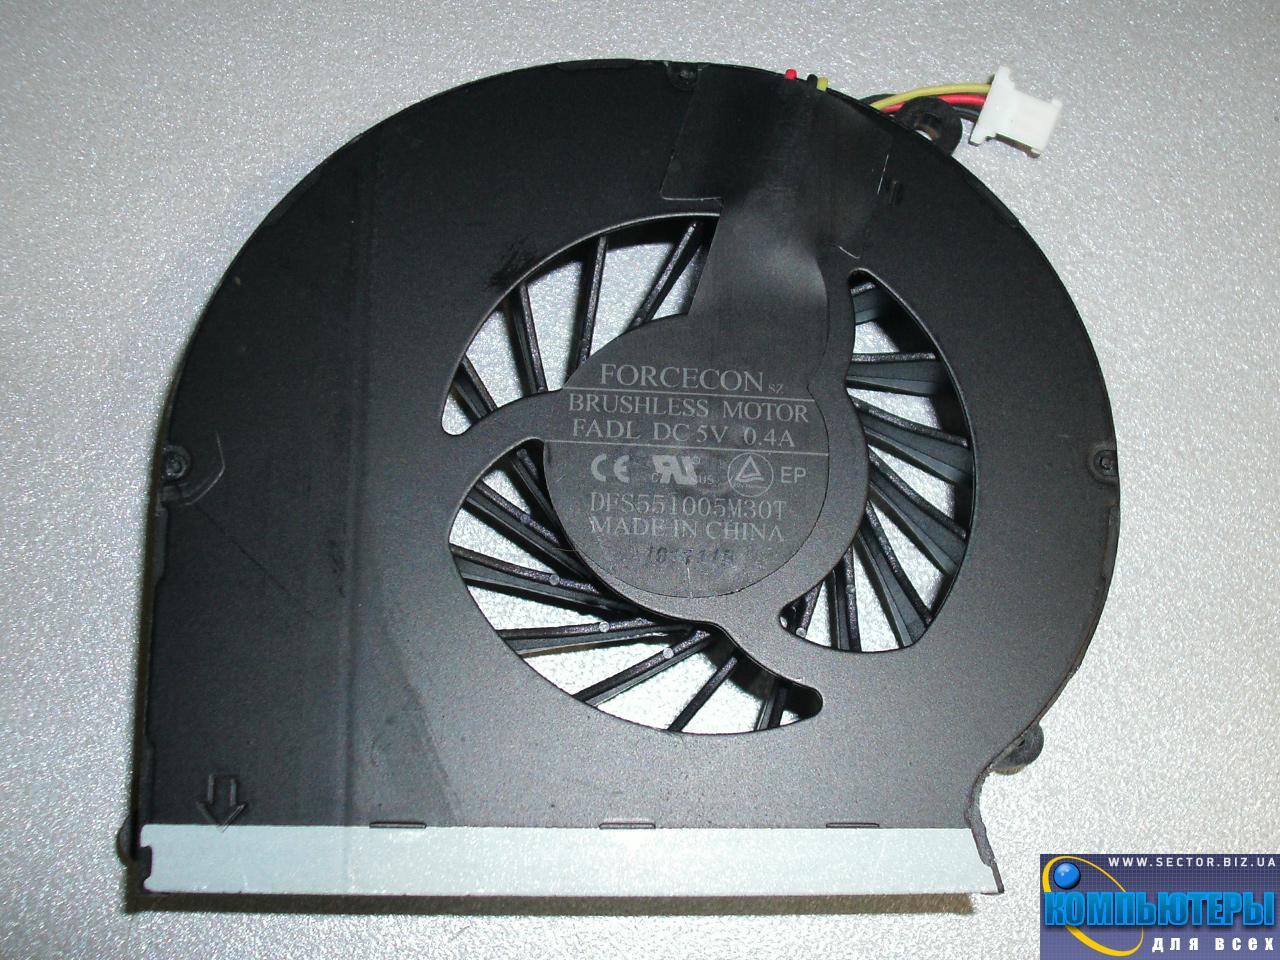 Кулер к ноутбуку HP Compaq CQ43 CQ57 CQ631 CQ635 G57 G43  430 431 435 436 630 p/n: DFS551005M30T FADL. Фото № 1.